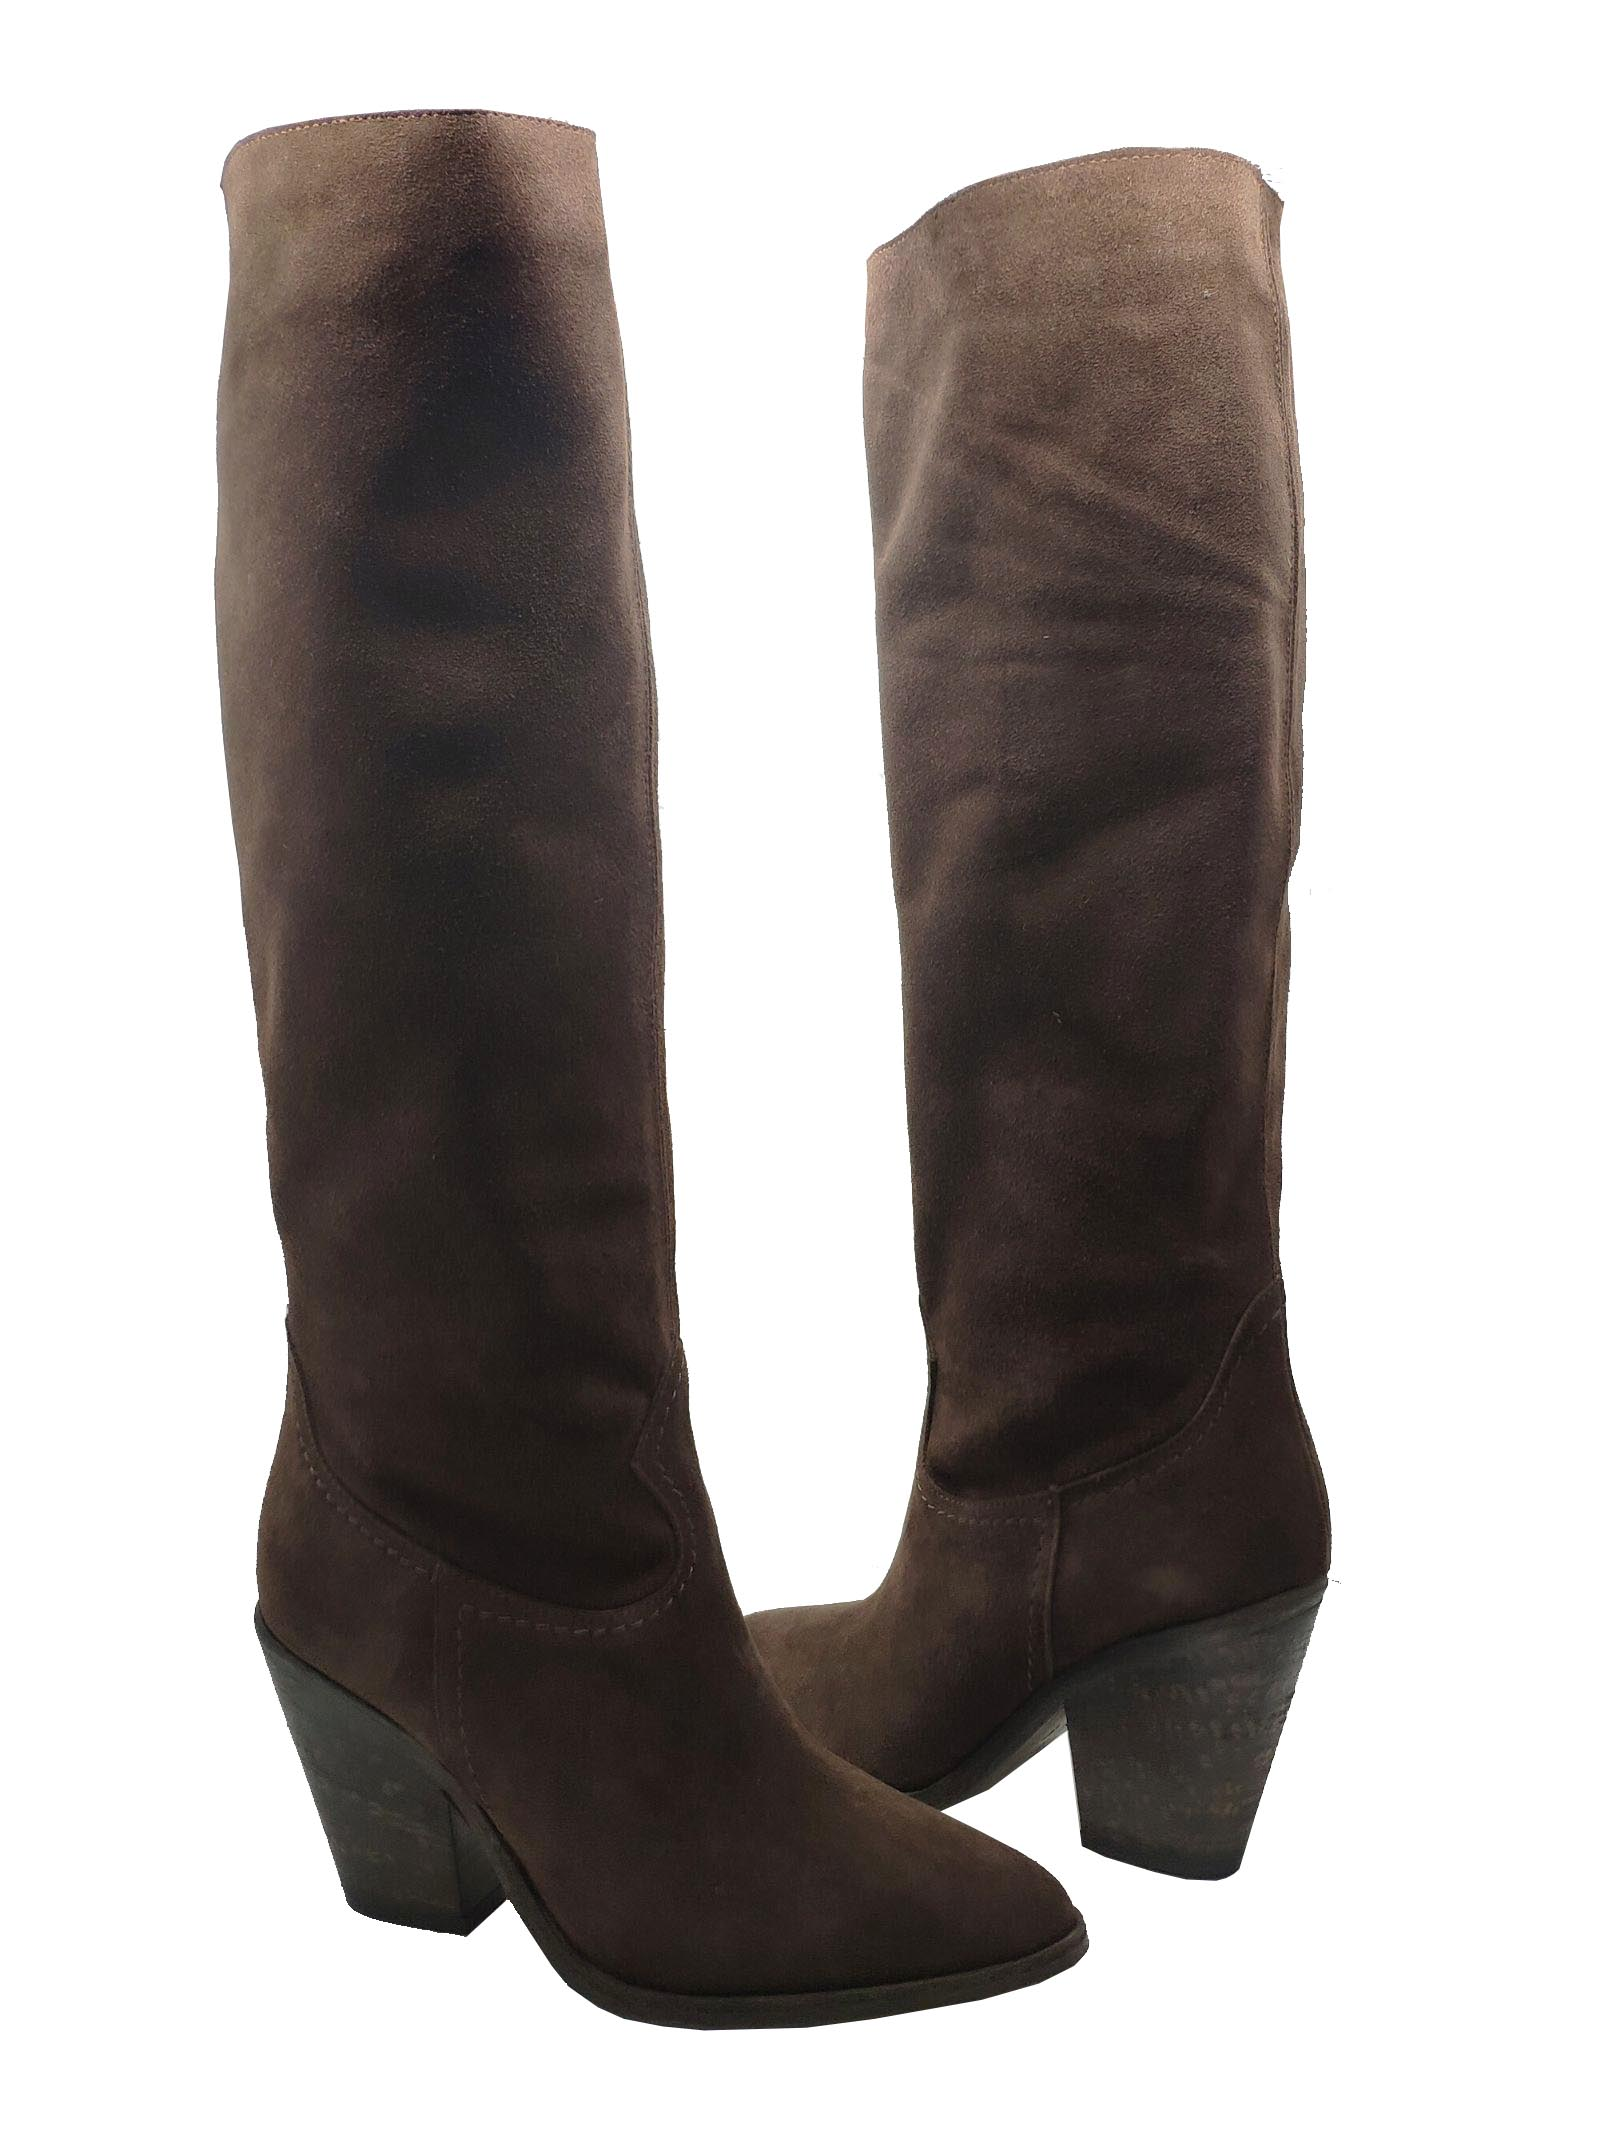 Women's Texan Boots Spatarella | Boots | P210MORO